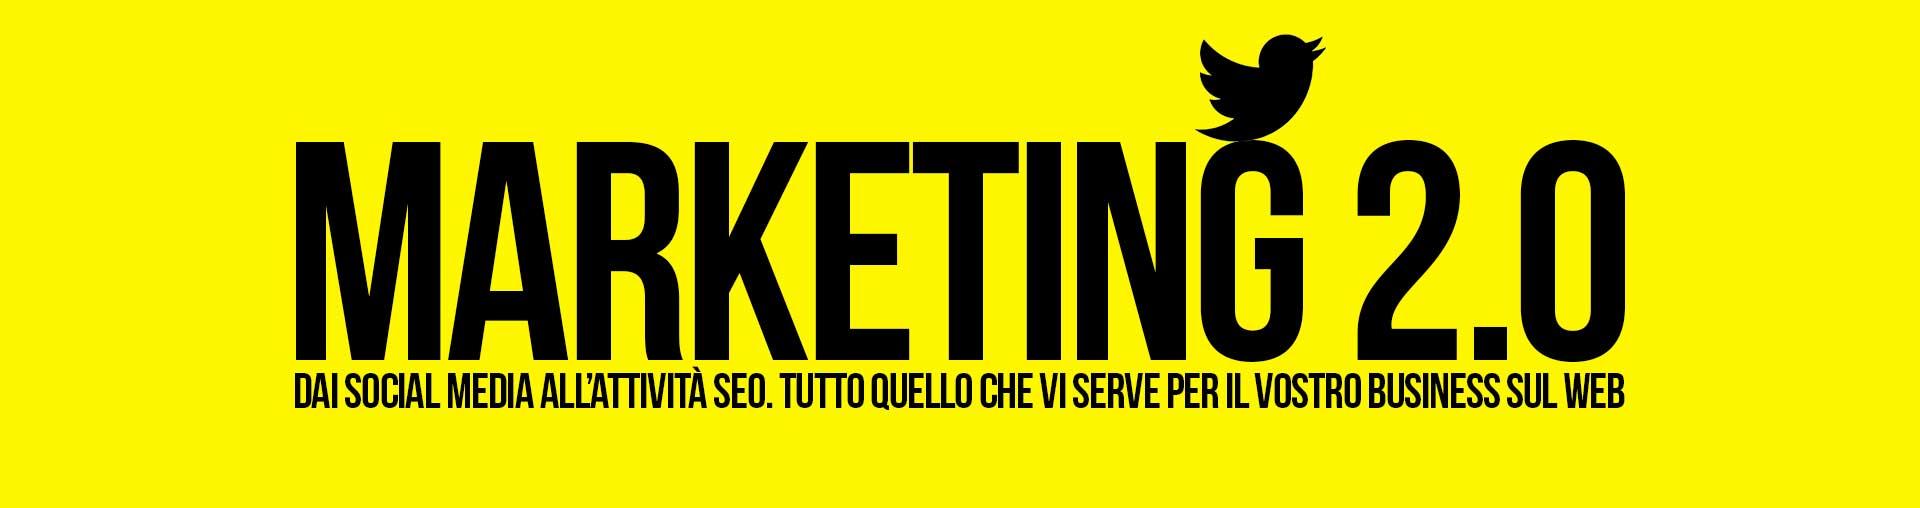 digital marketing and web marketing agency